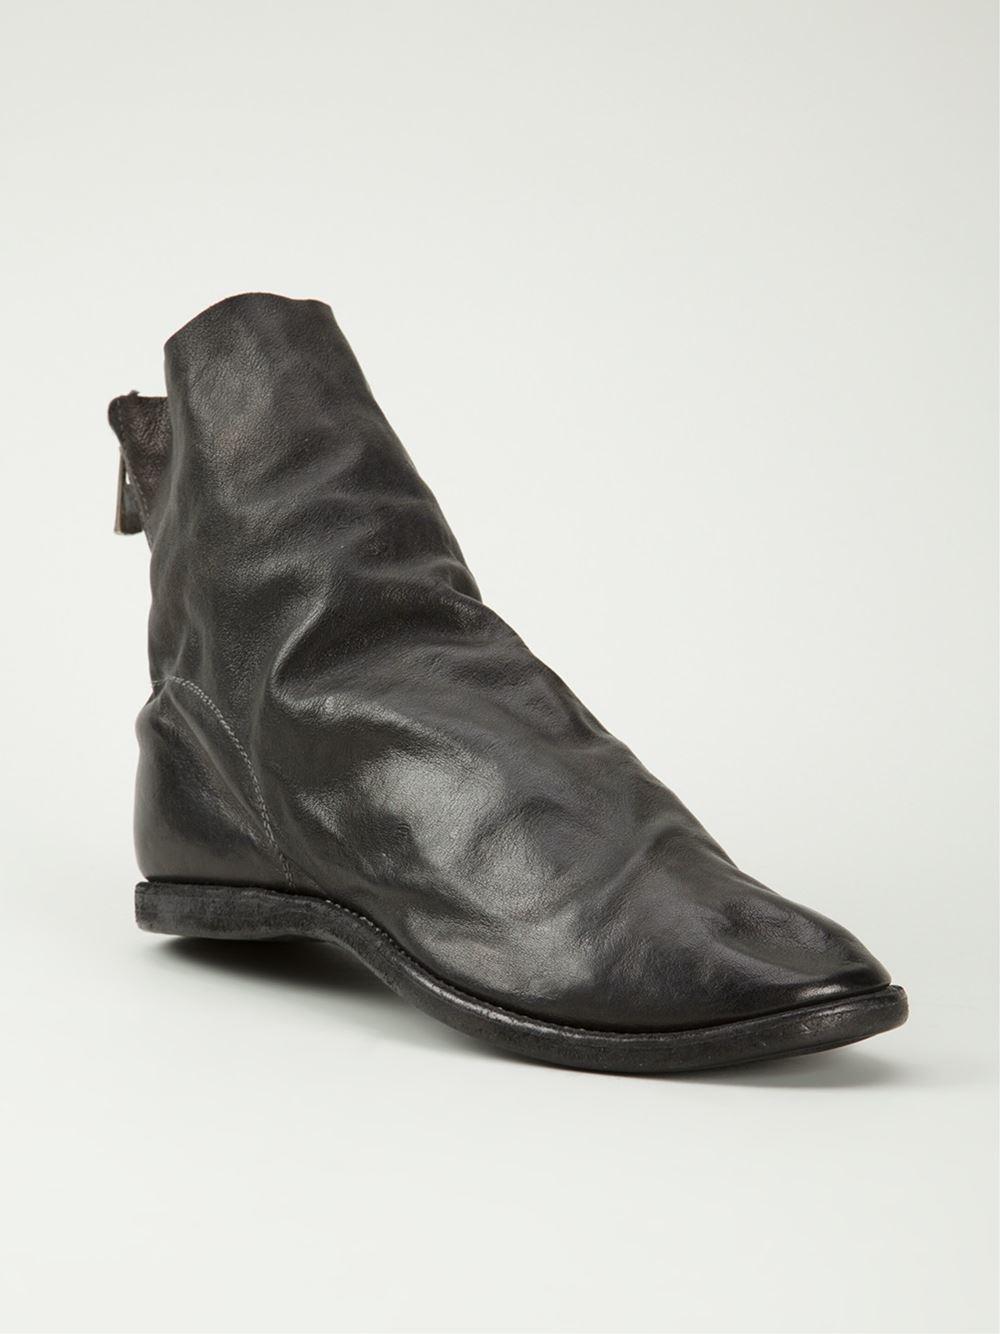 Lyst Guidi Kangaroo Back Zip Boots In Black For Men